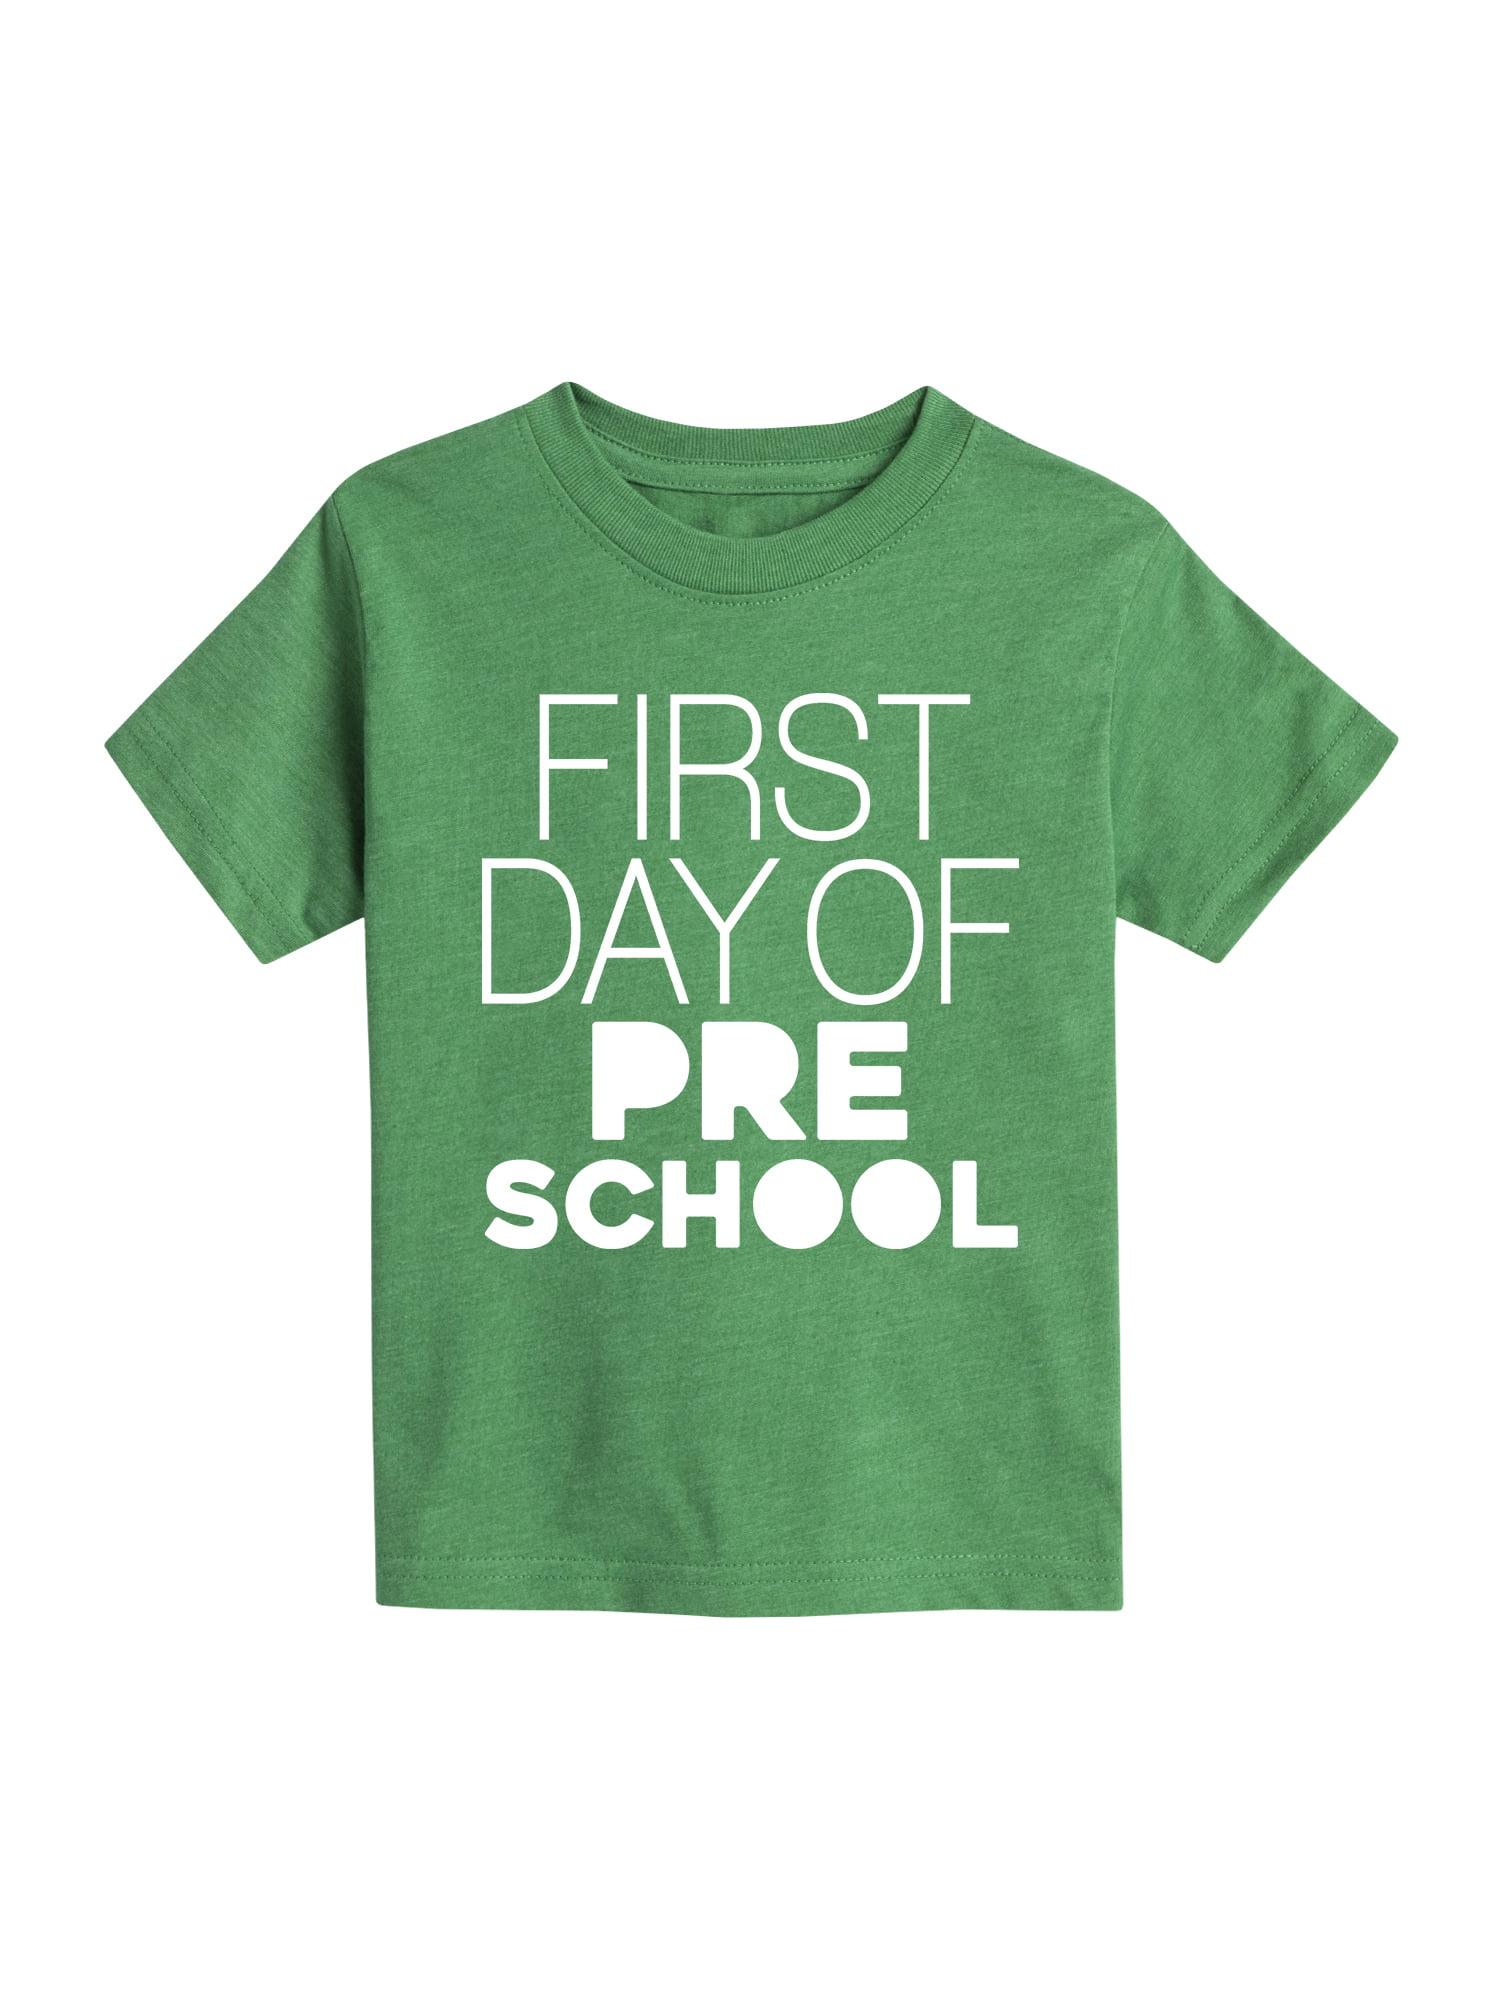 First Day Of Preschool  - Toddler Short Sleeve Tee